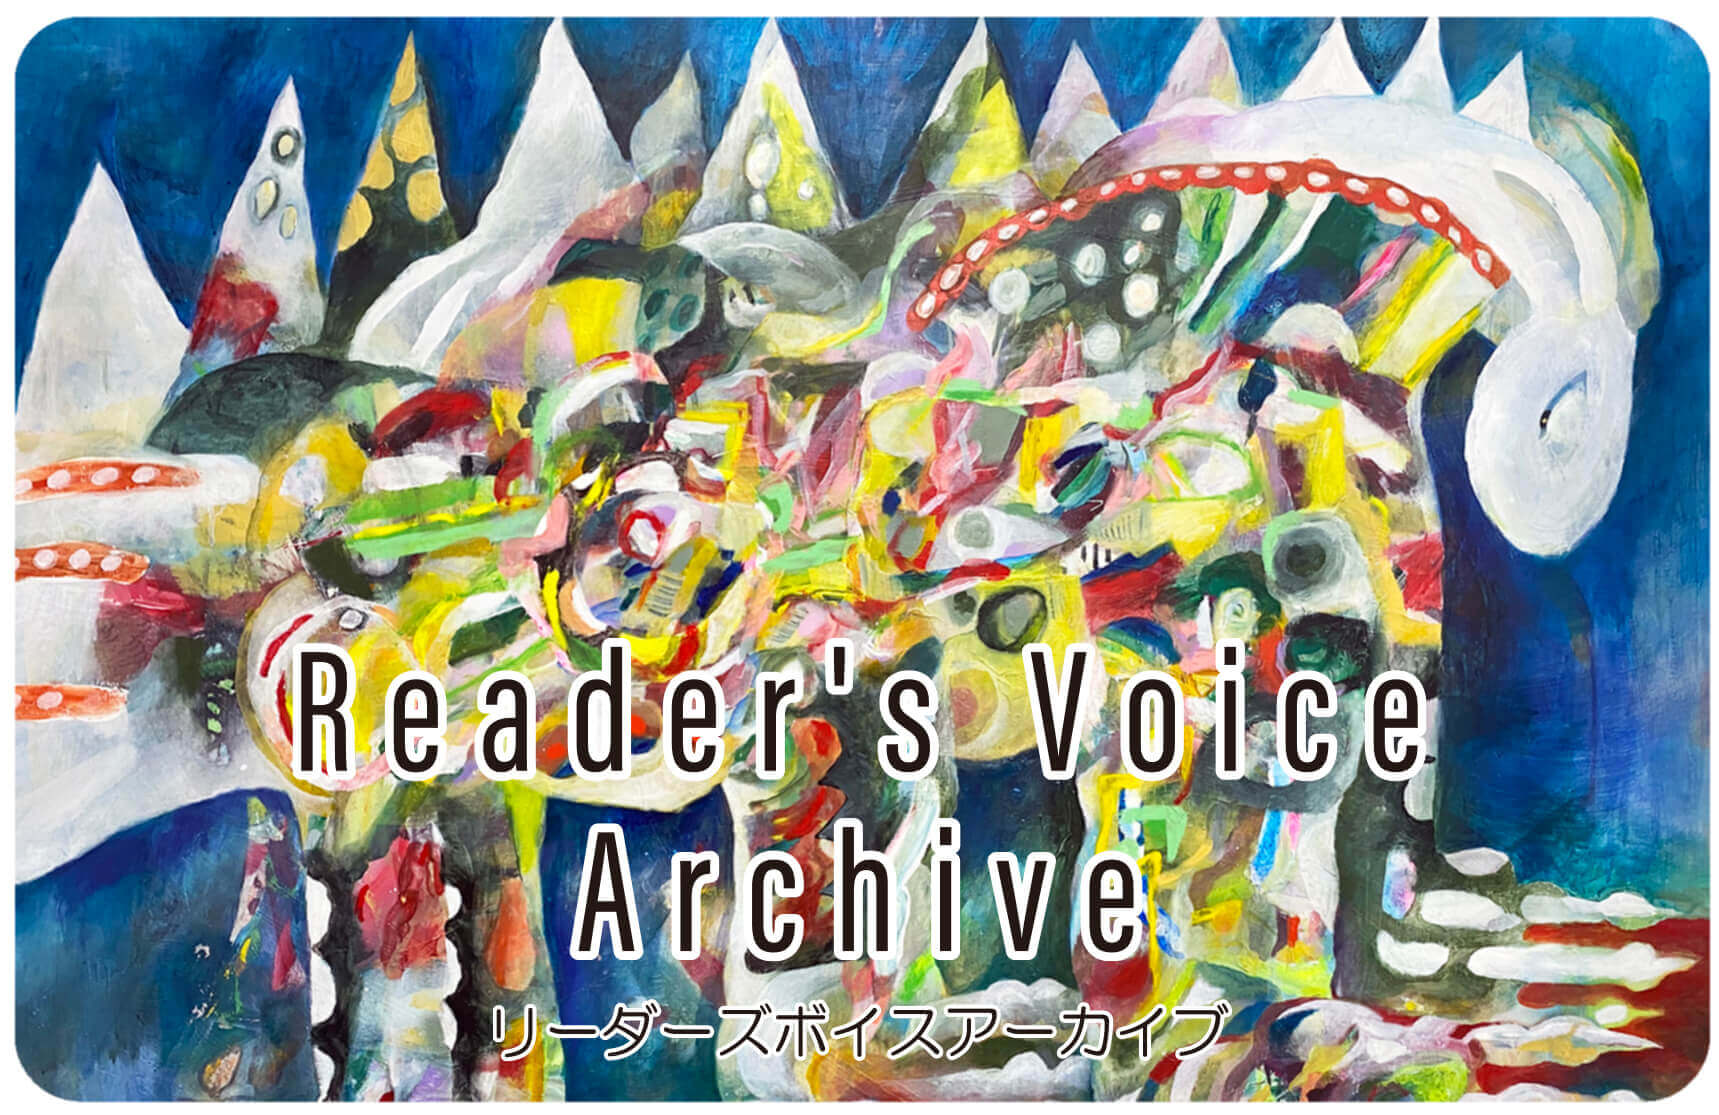 Reader's Voice Archive